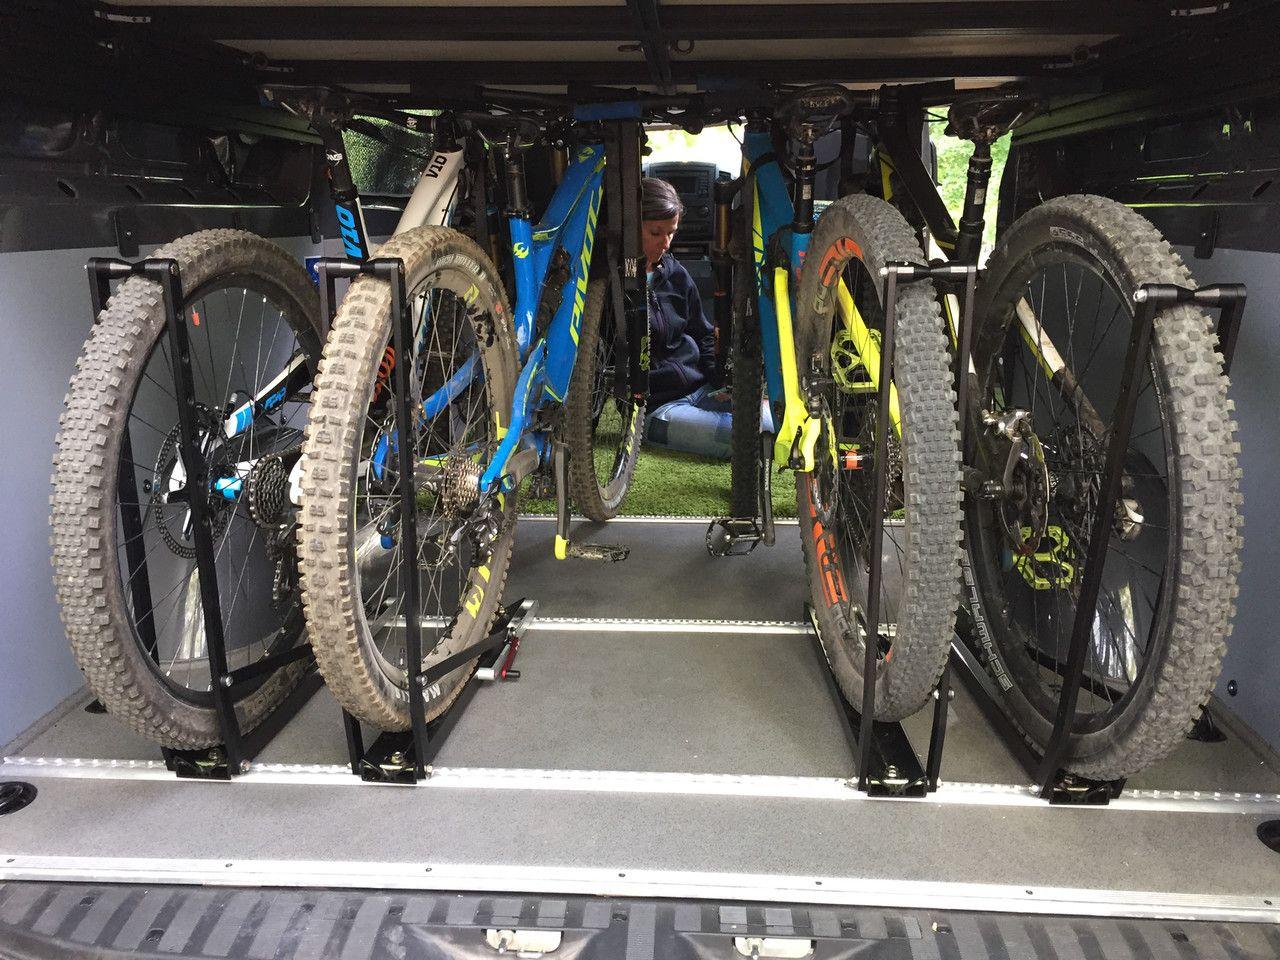 Sprinter 4x4 gear hauler and camper bike rack